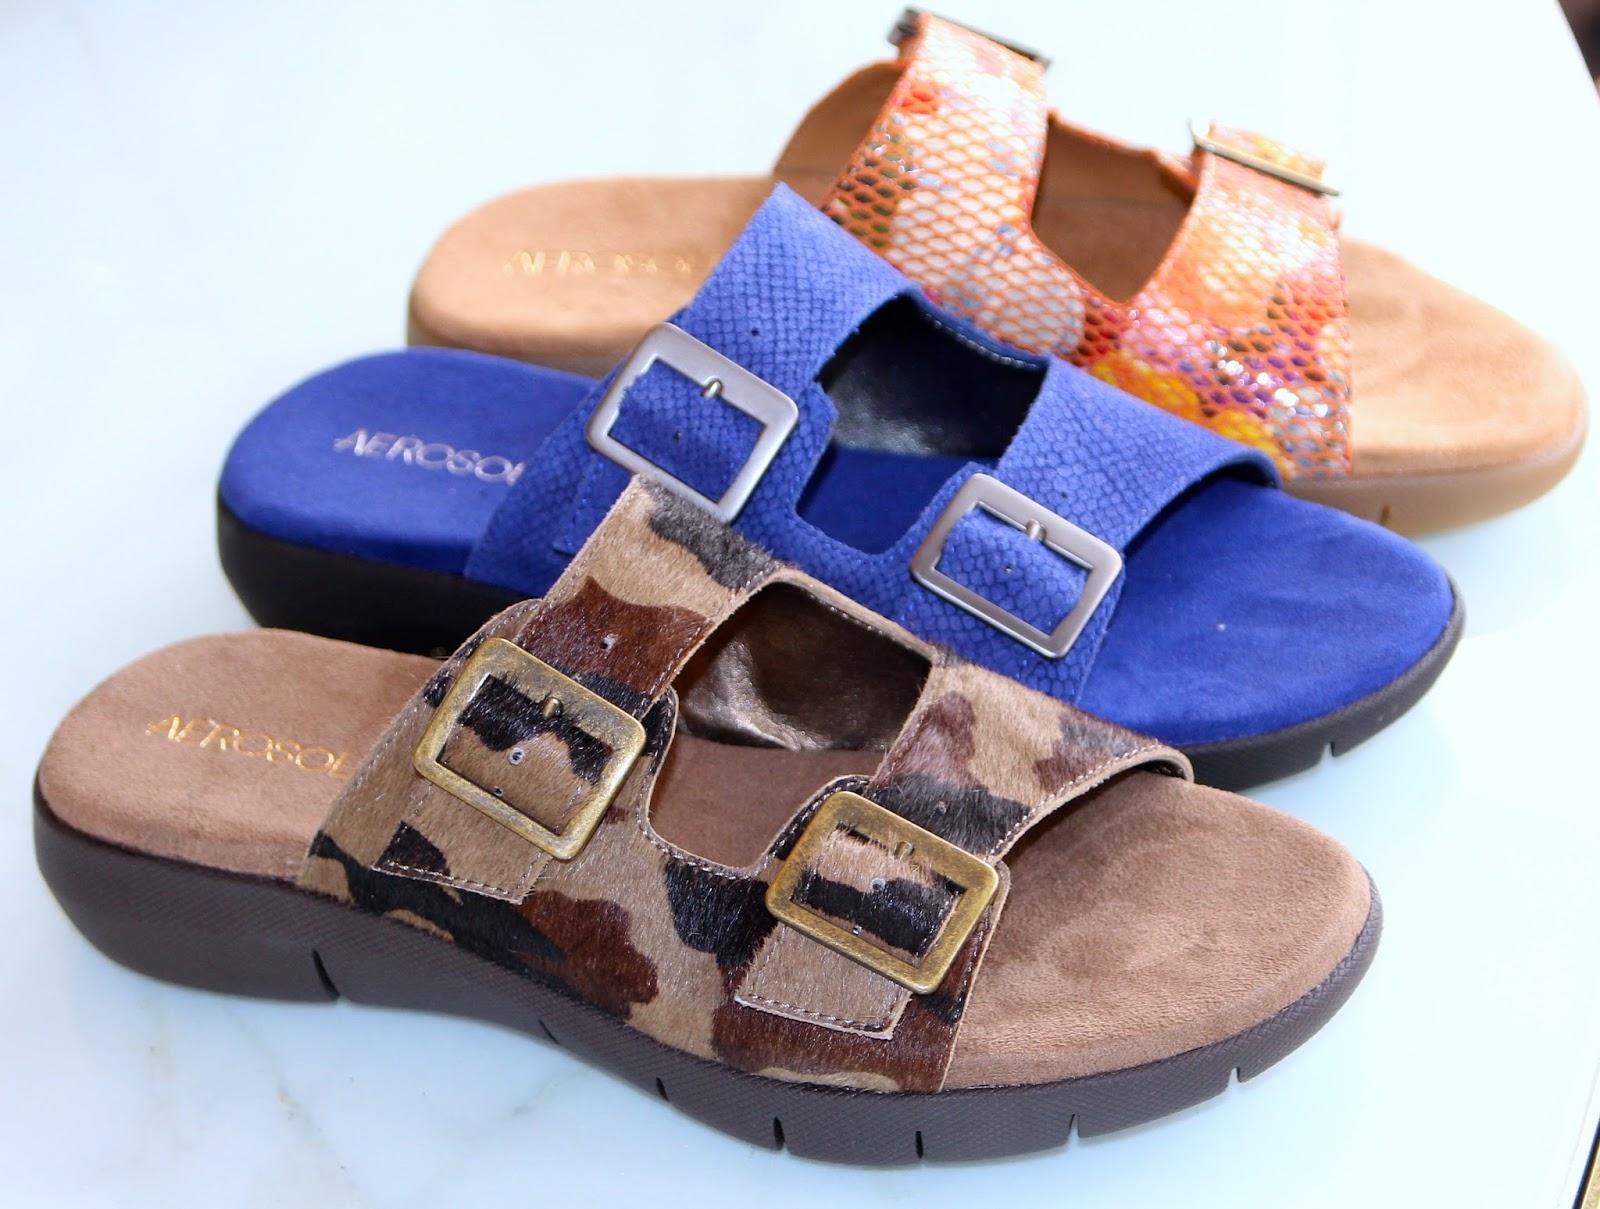 052118422e8 Wip Code double buckle sport sandal----in camo